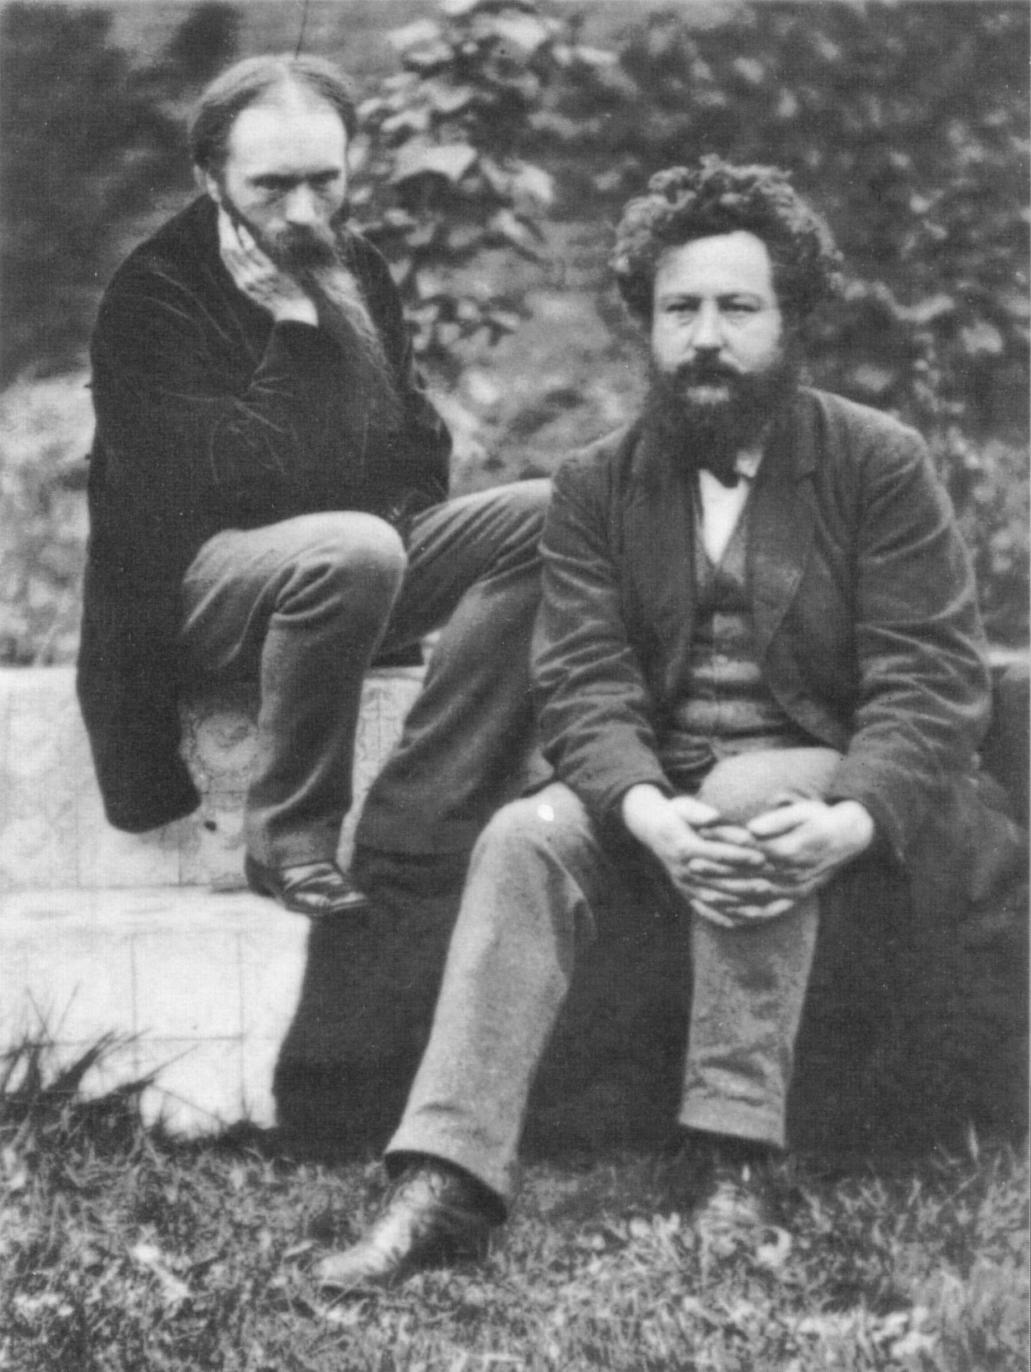 Photograph of Edward Burne-Jones (left) and William Morris (right) at the Grange, 1874